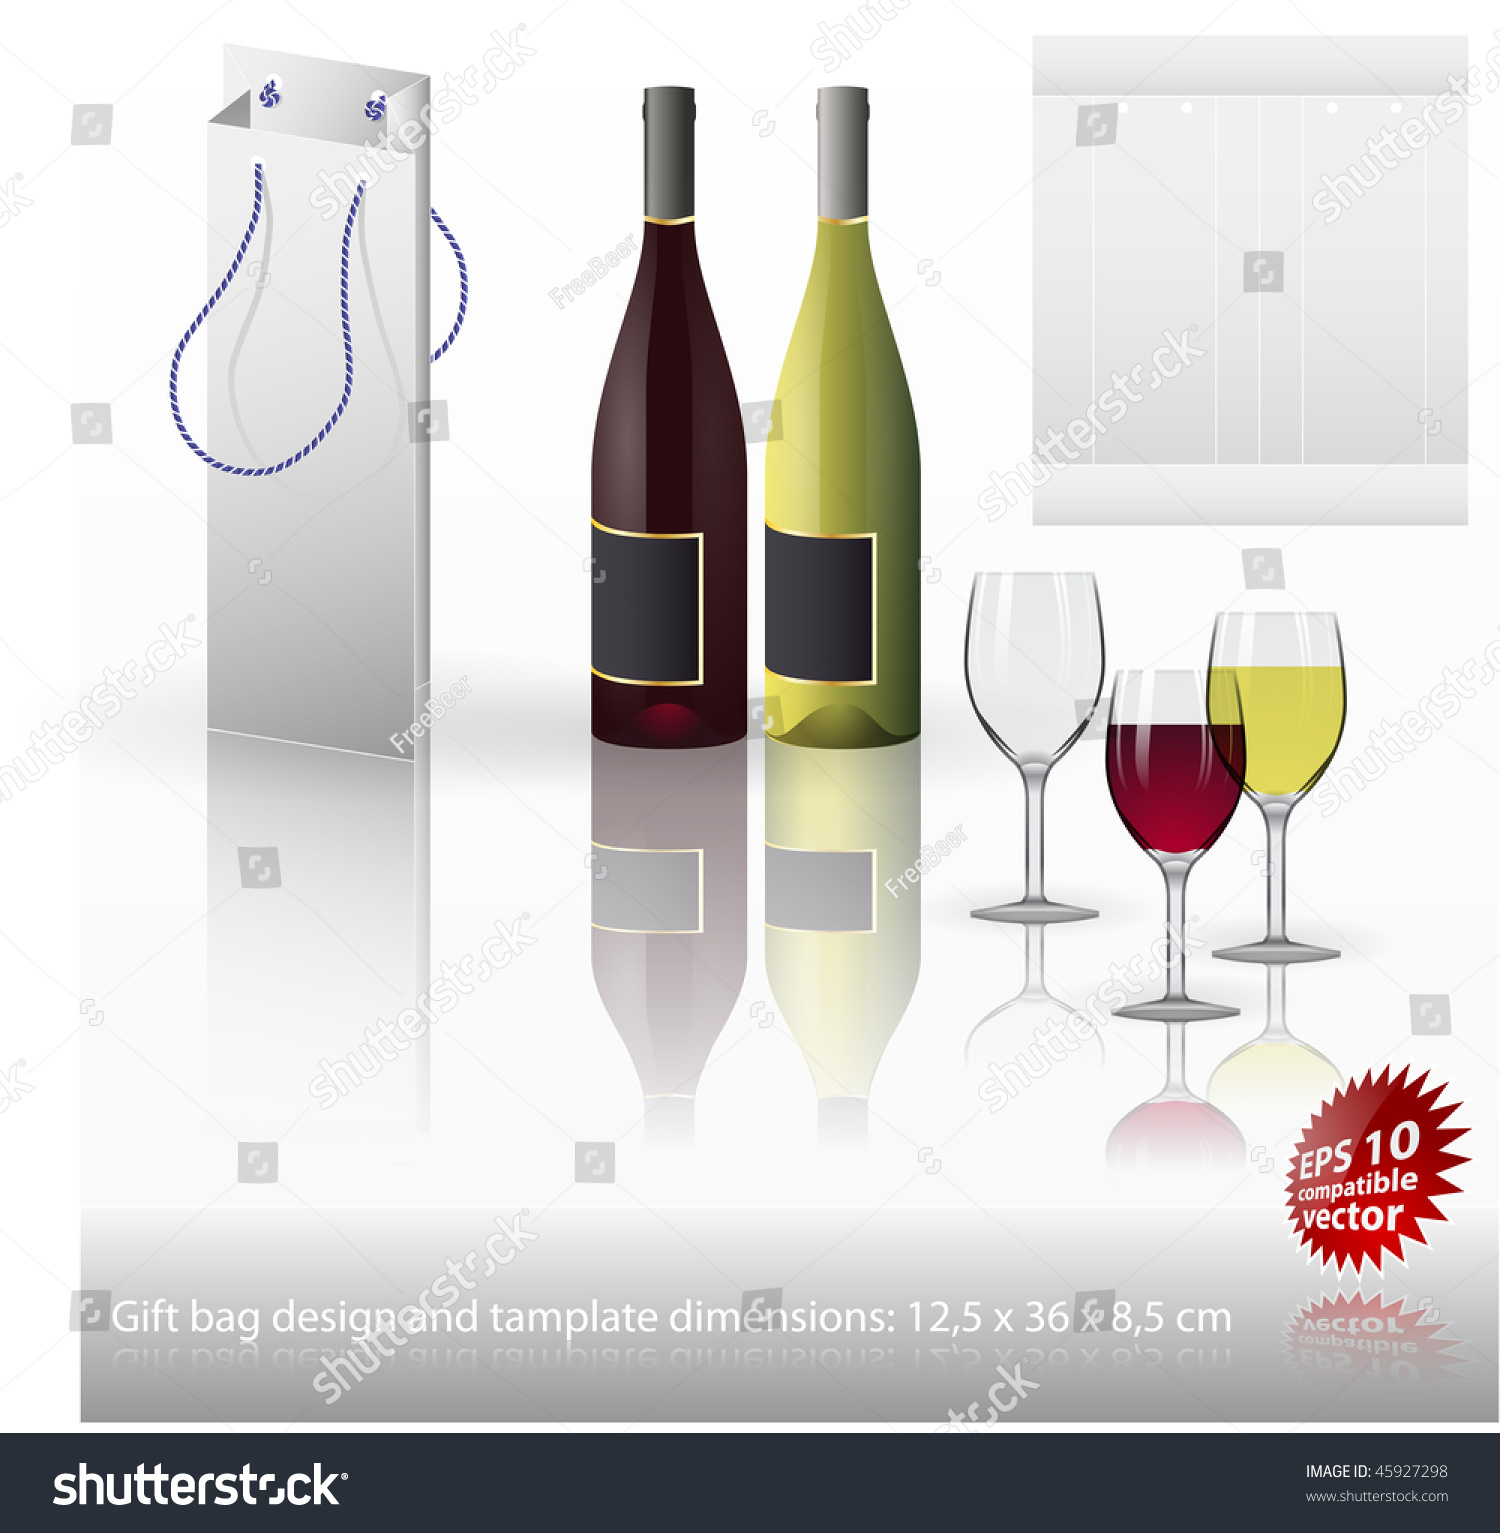 Wine Bottle Gift Bag Template Glasses Stock Vector Royalty Free